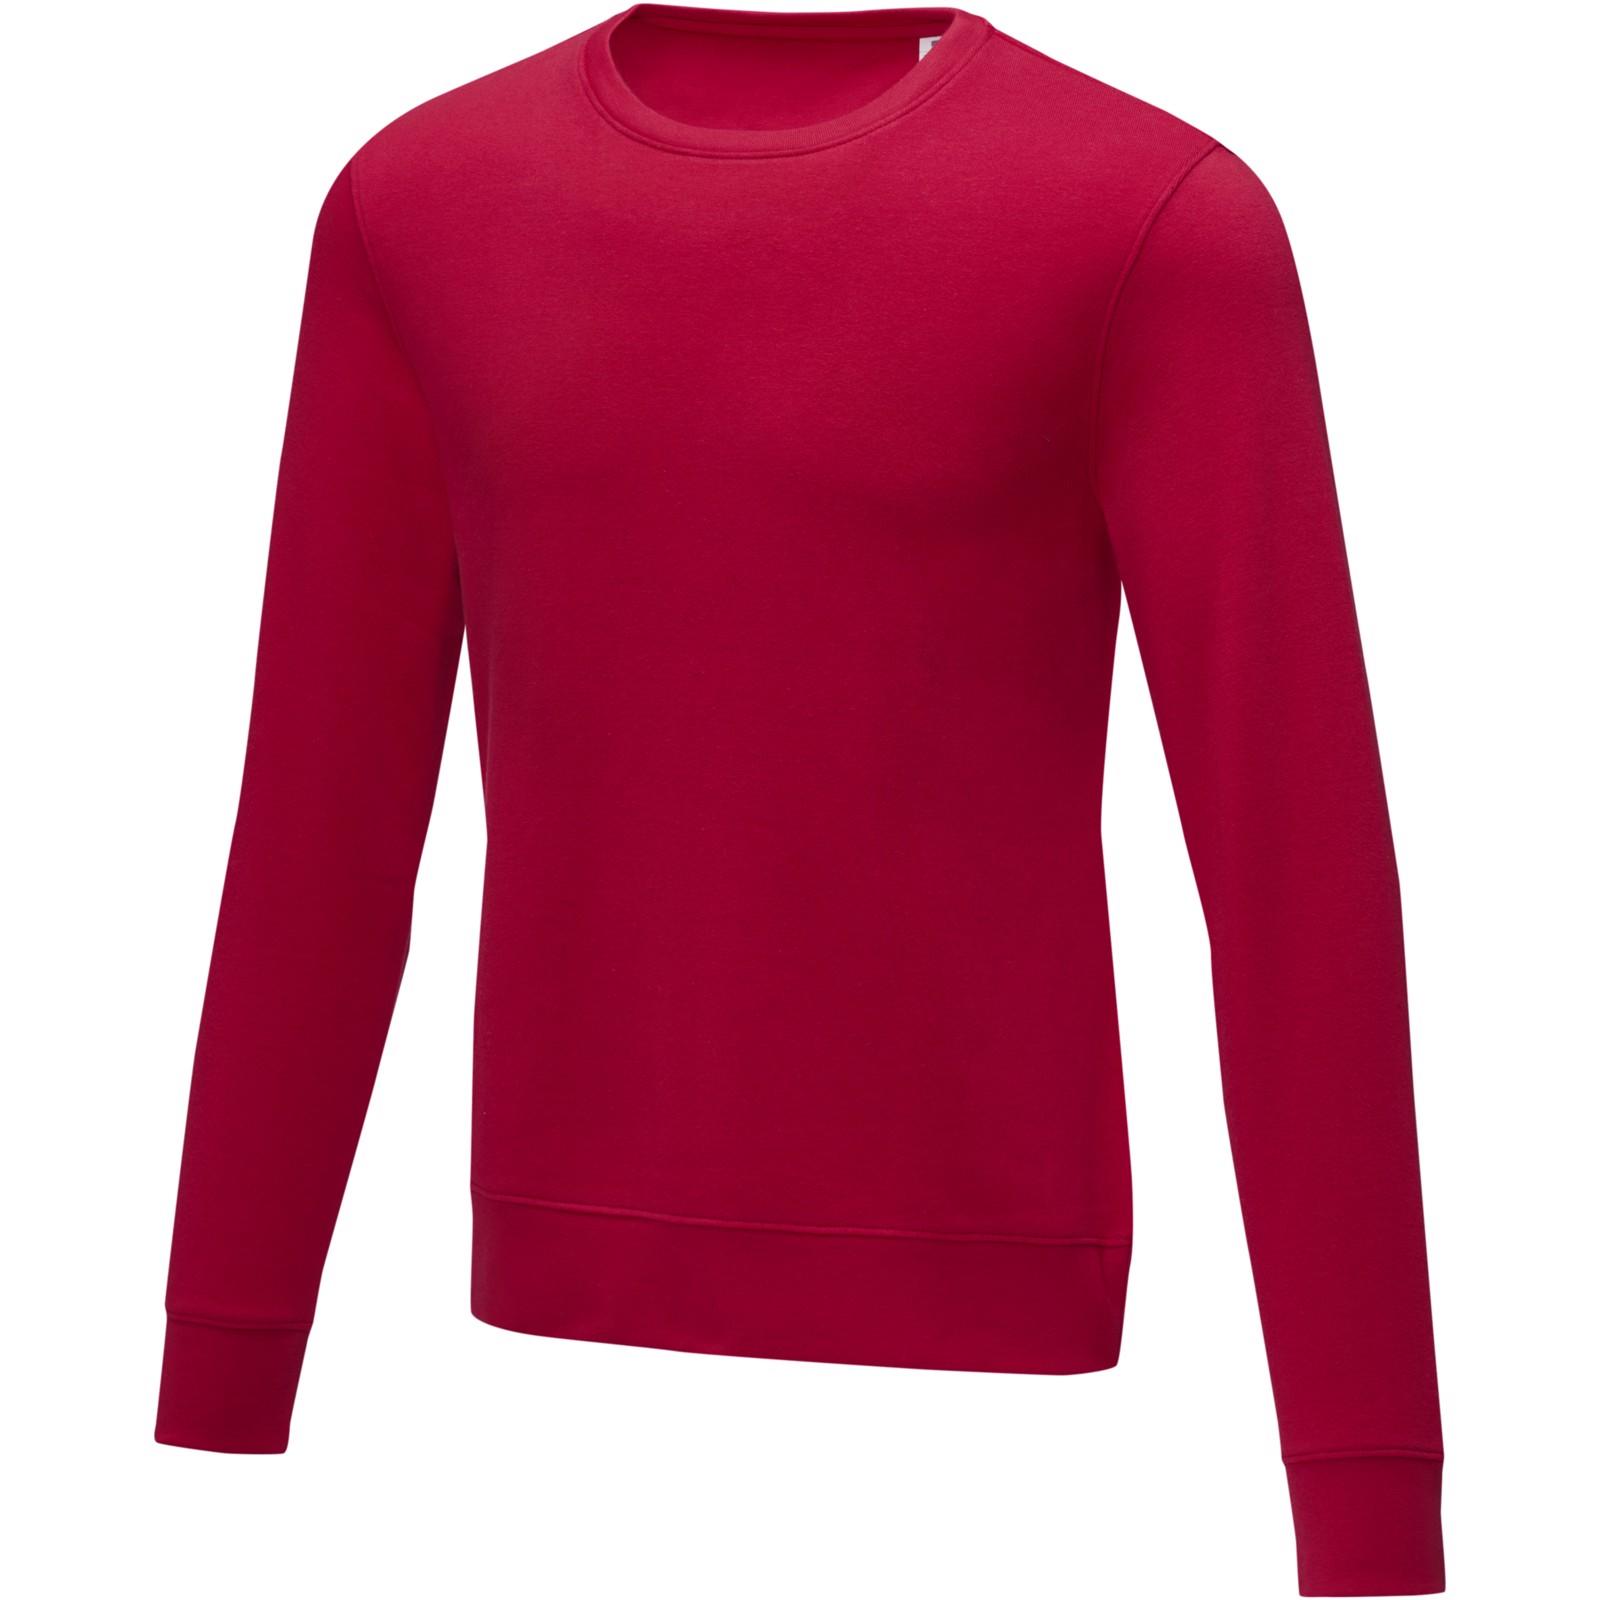 Zenon men's crewneck sweater - Red / XL